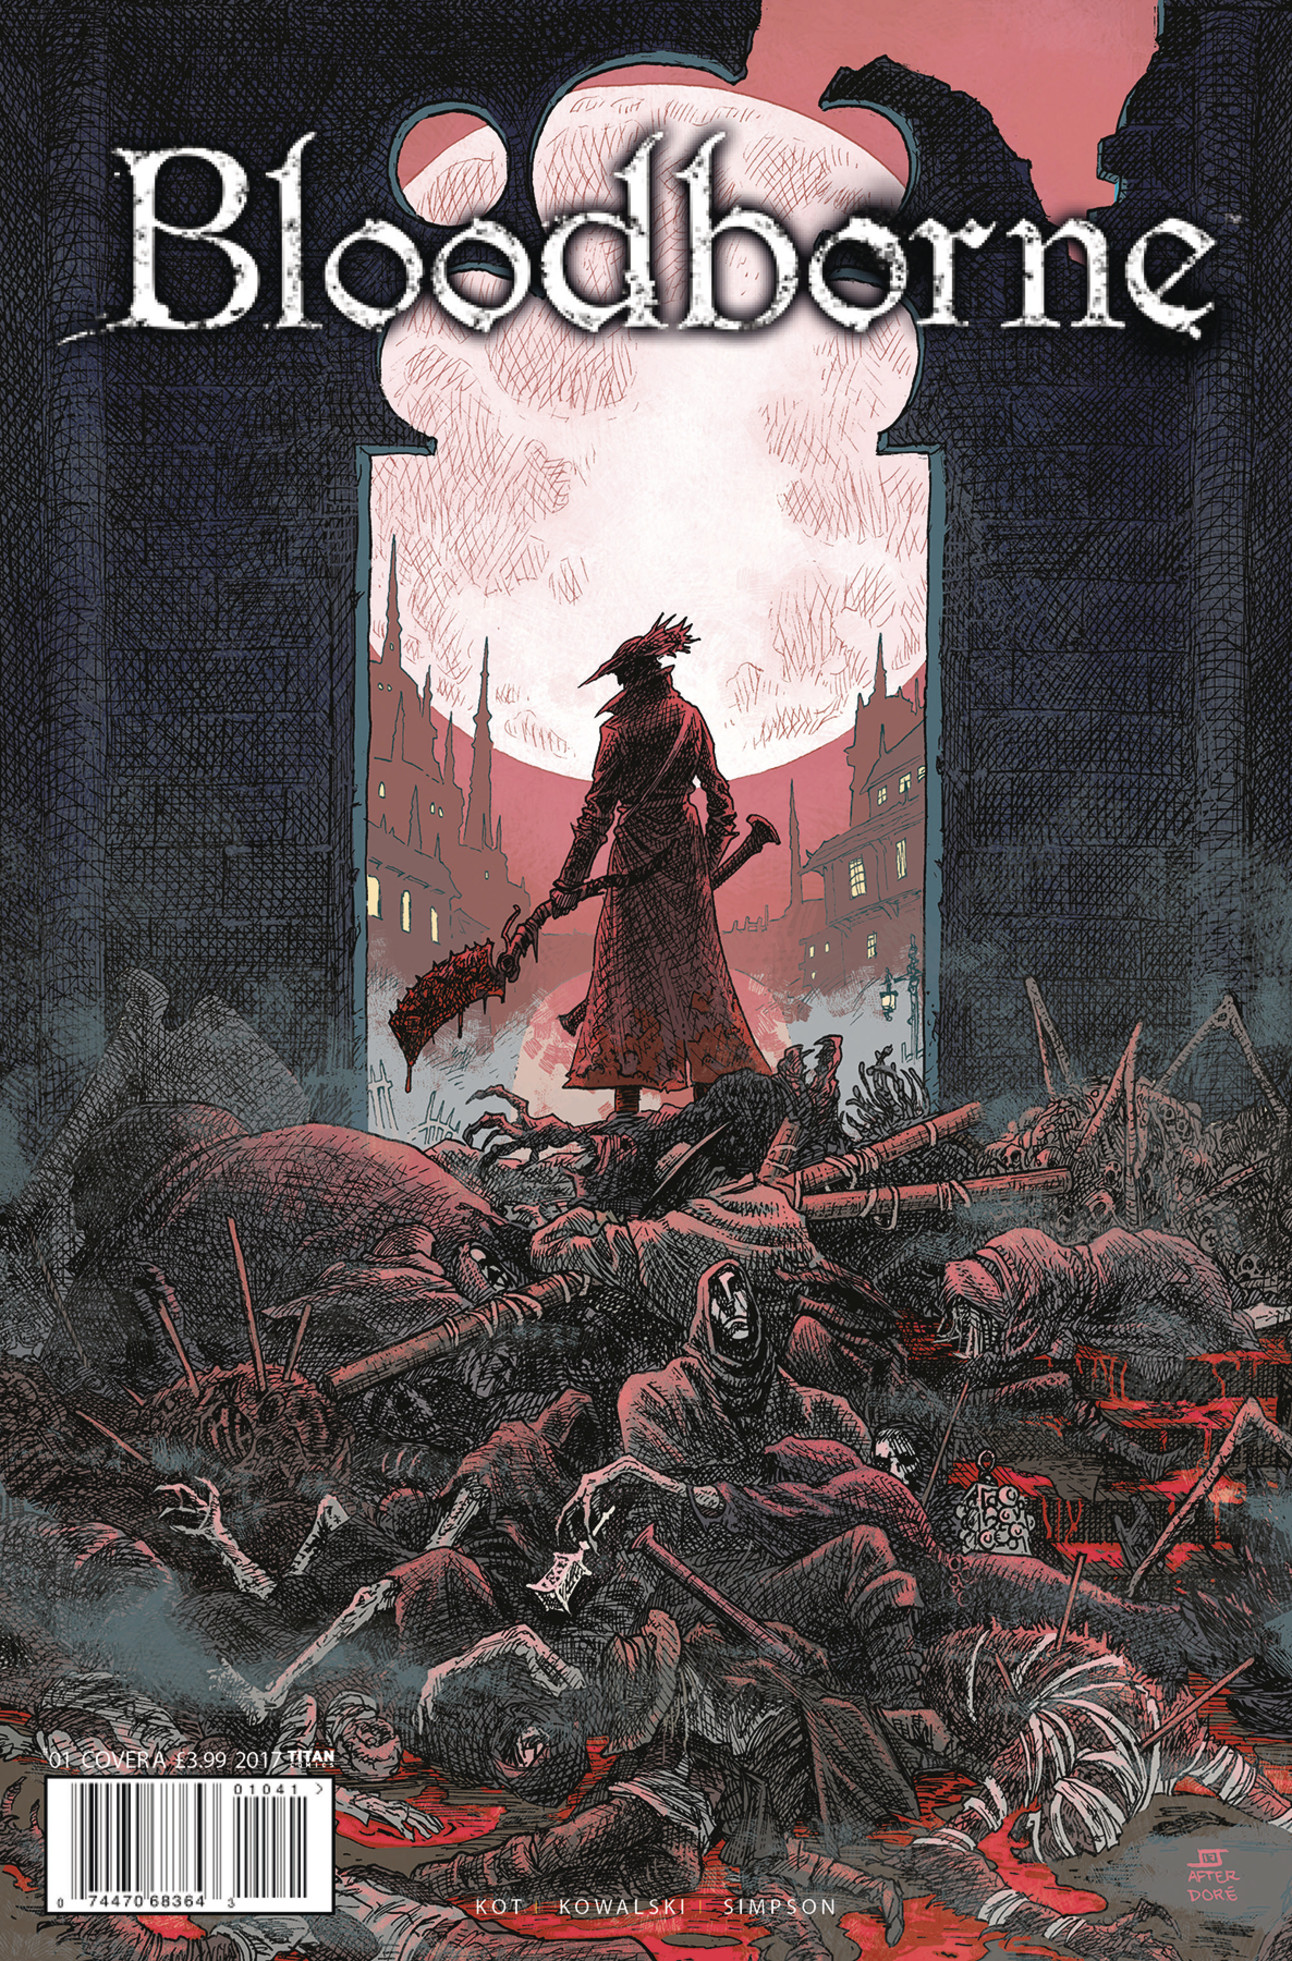 titan_bloodborne_cover_1.jpg